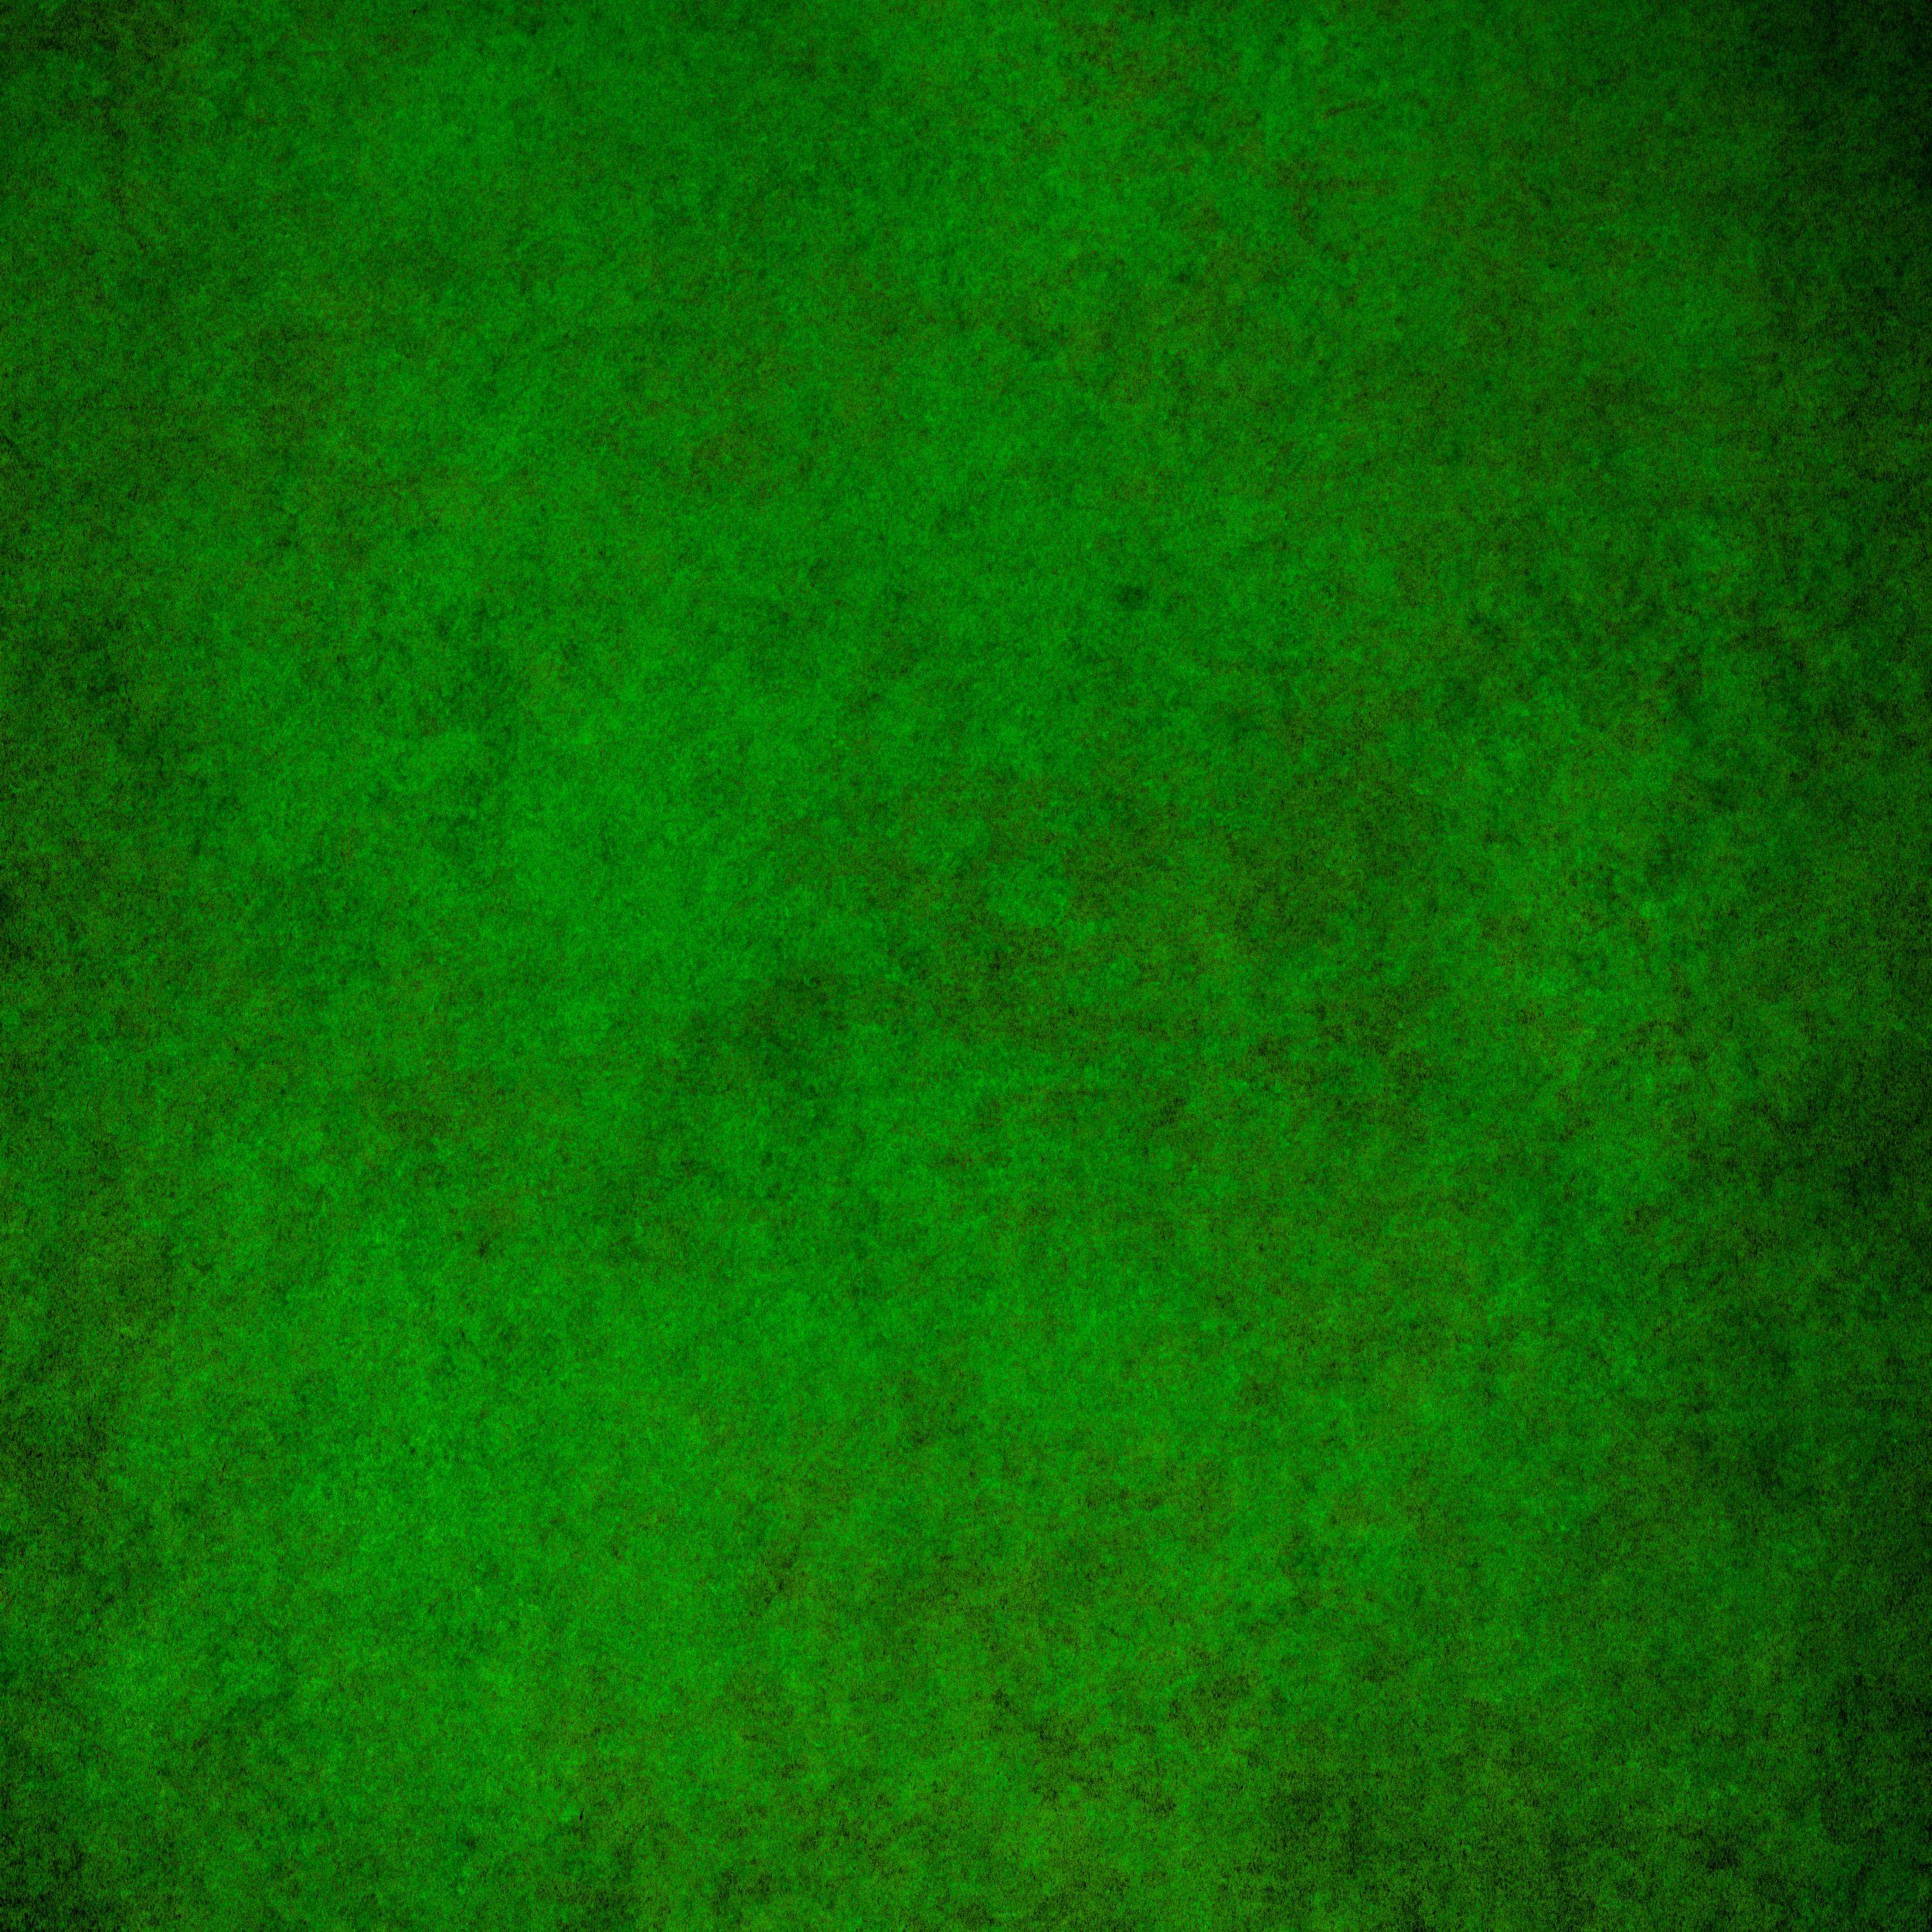 jungle-green-grunge-texture.jpg (2500×2500) | childish ...